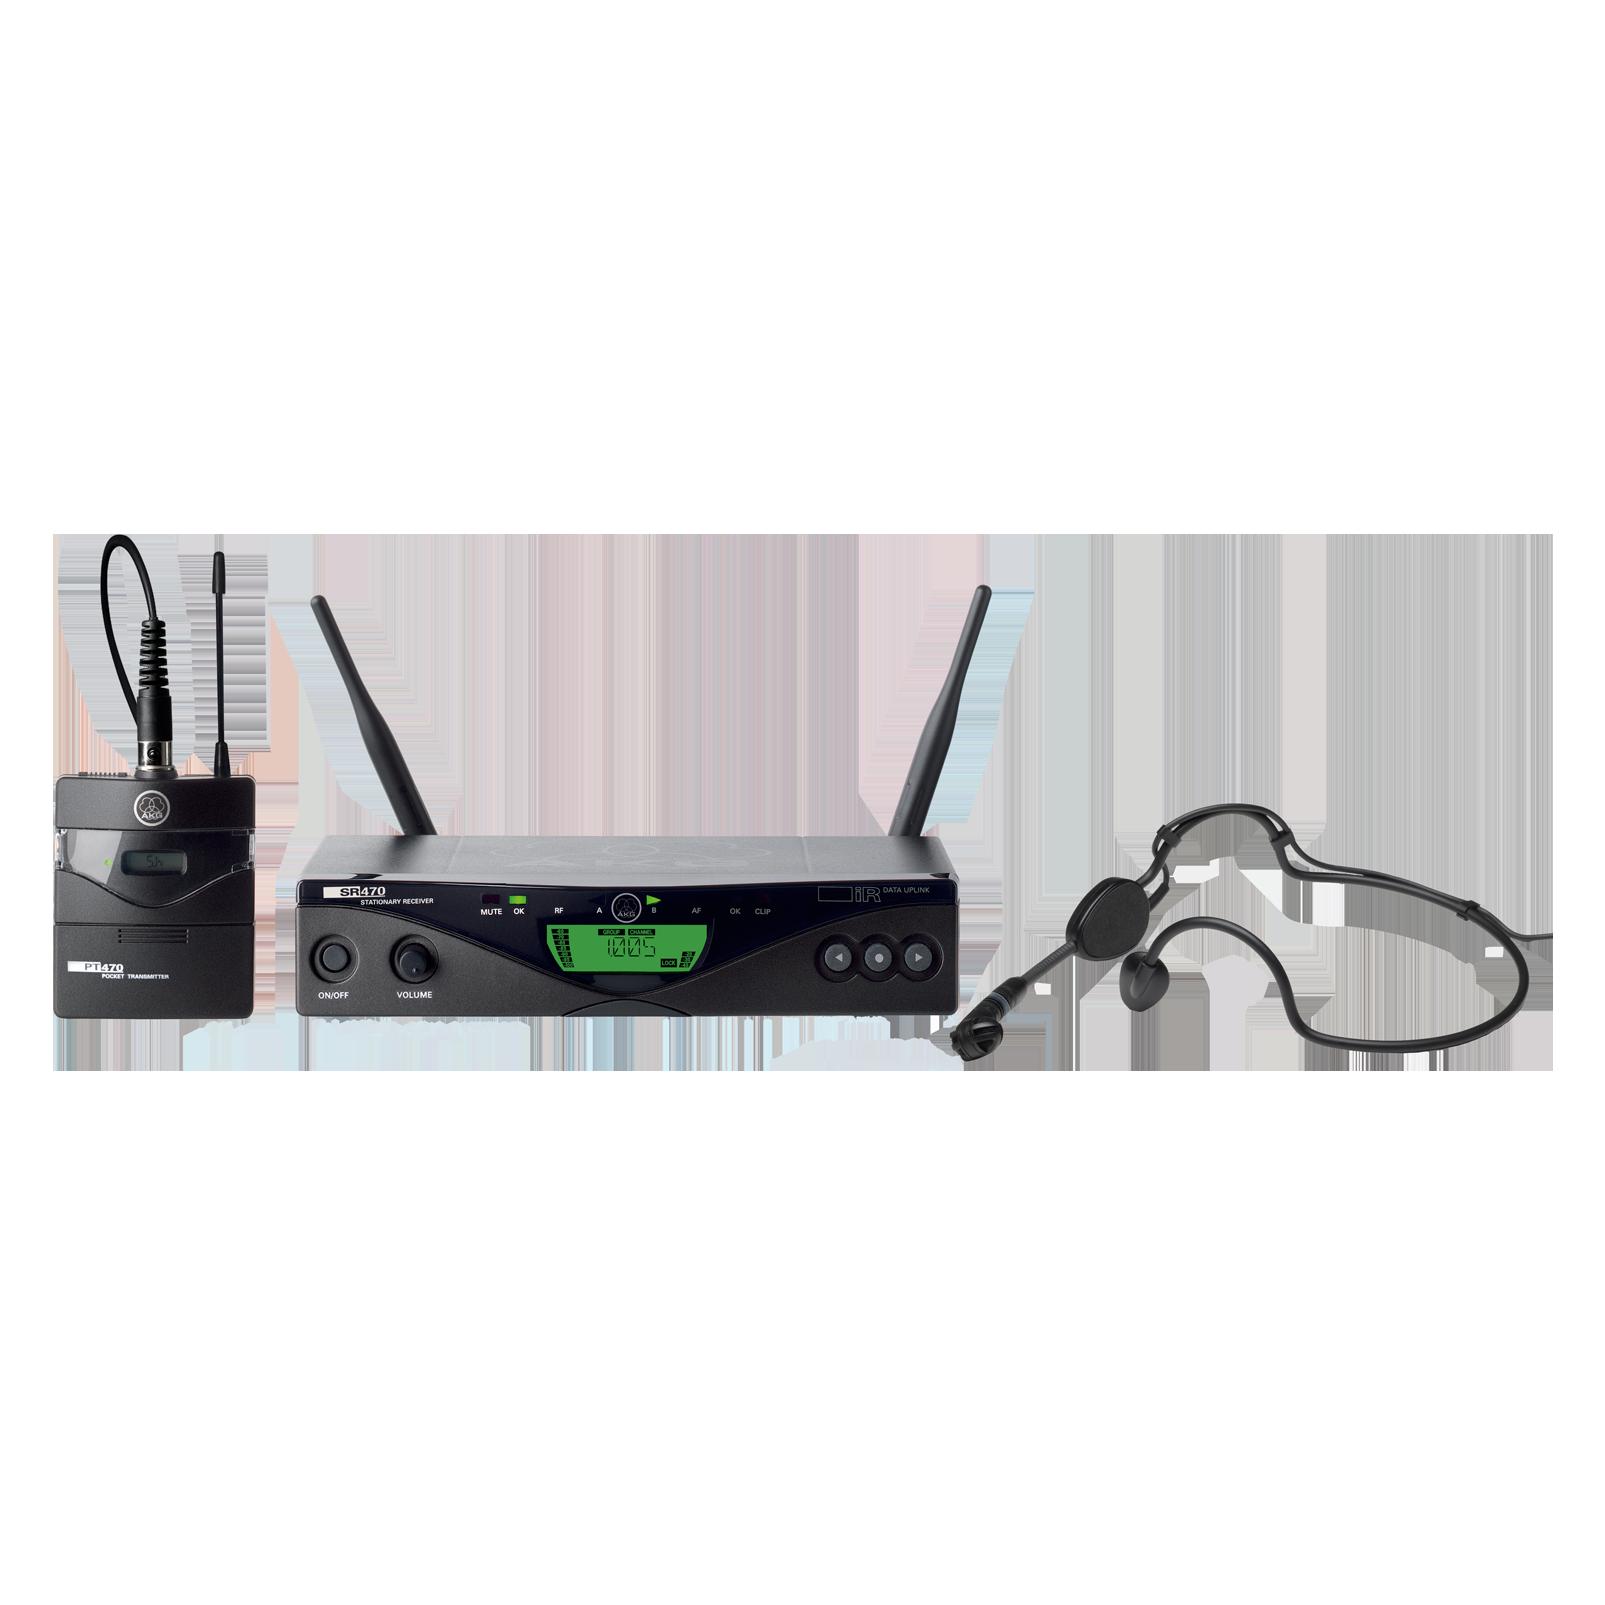 WMS470 Sports Set - Black - Professional wireless microphone system - Hero